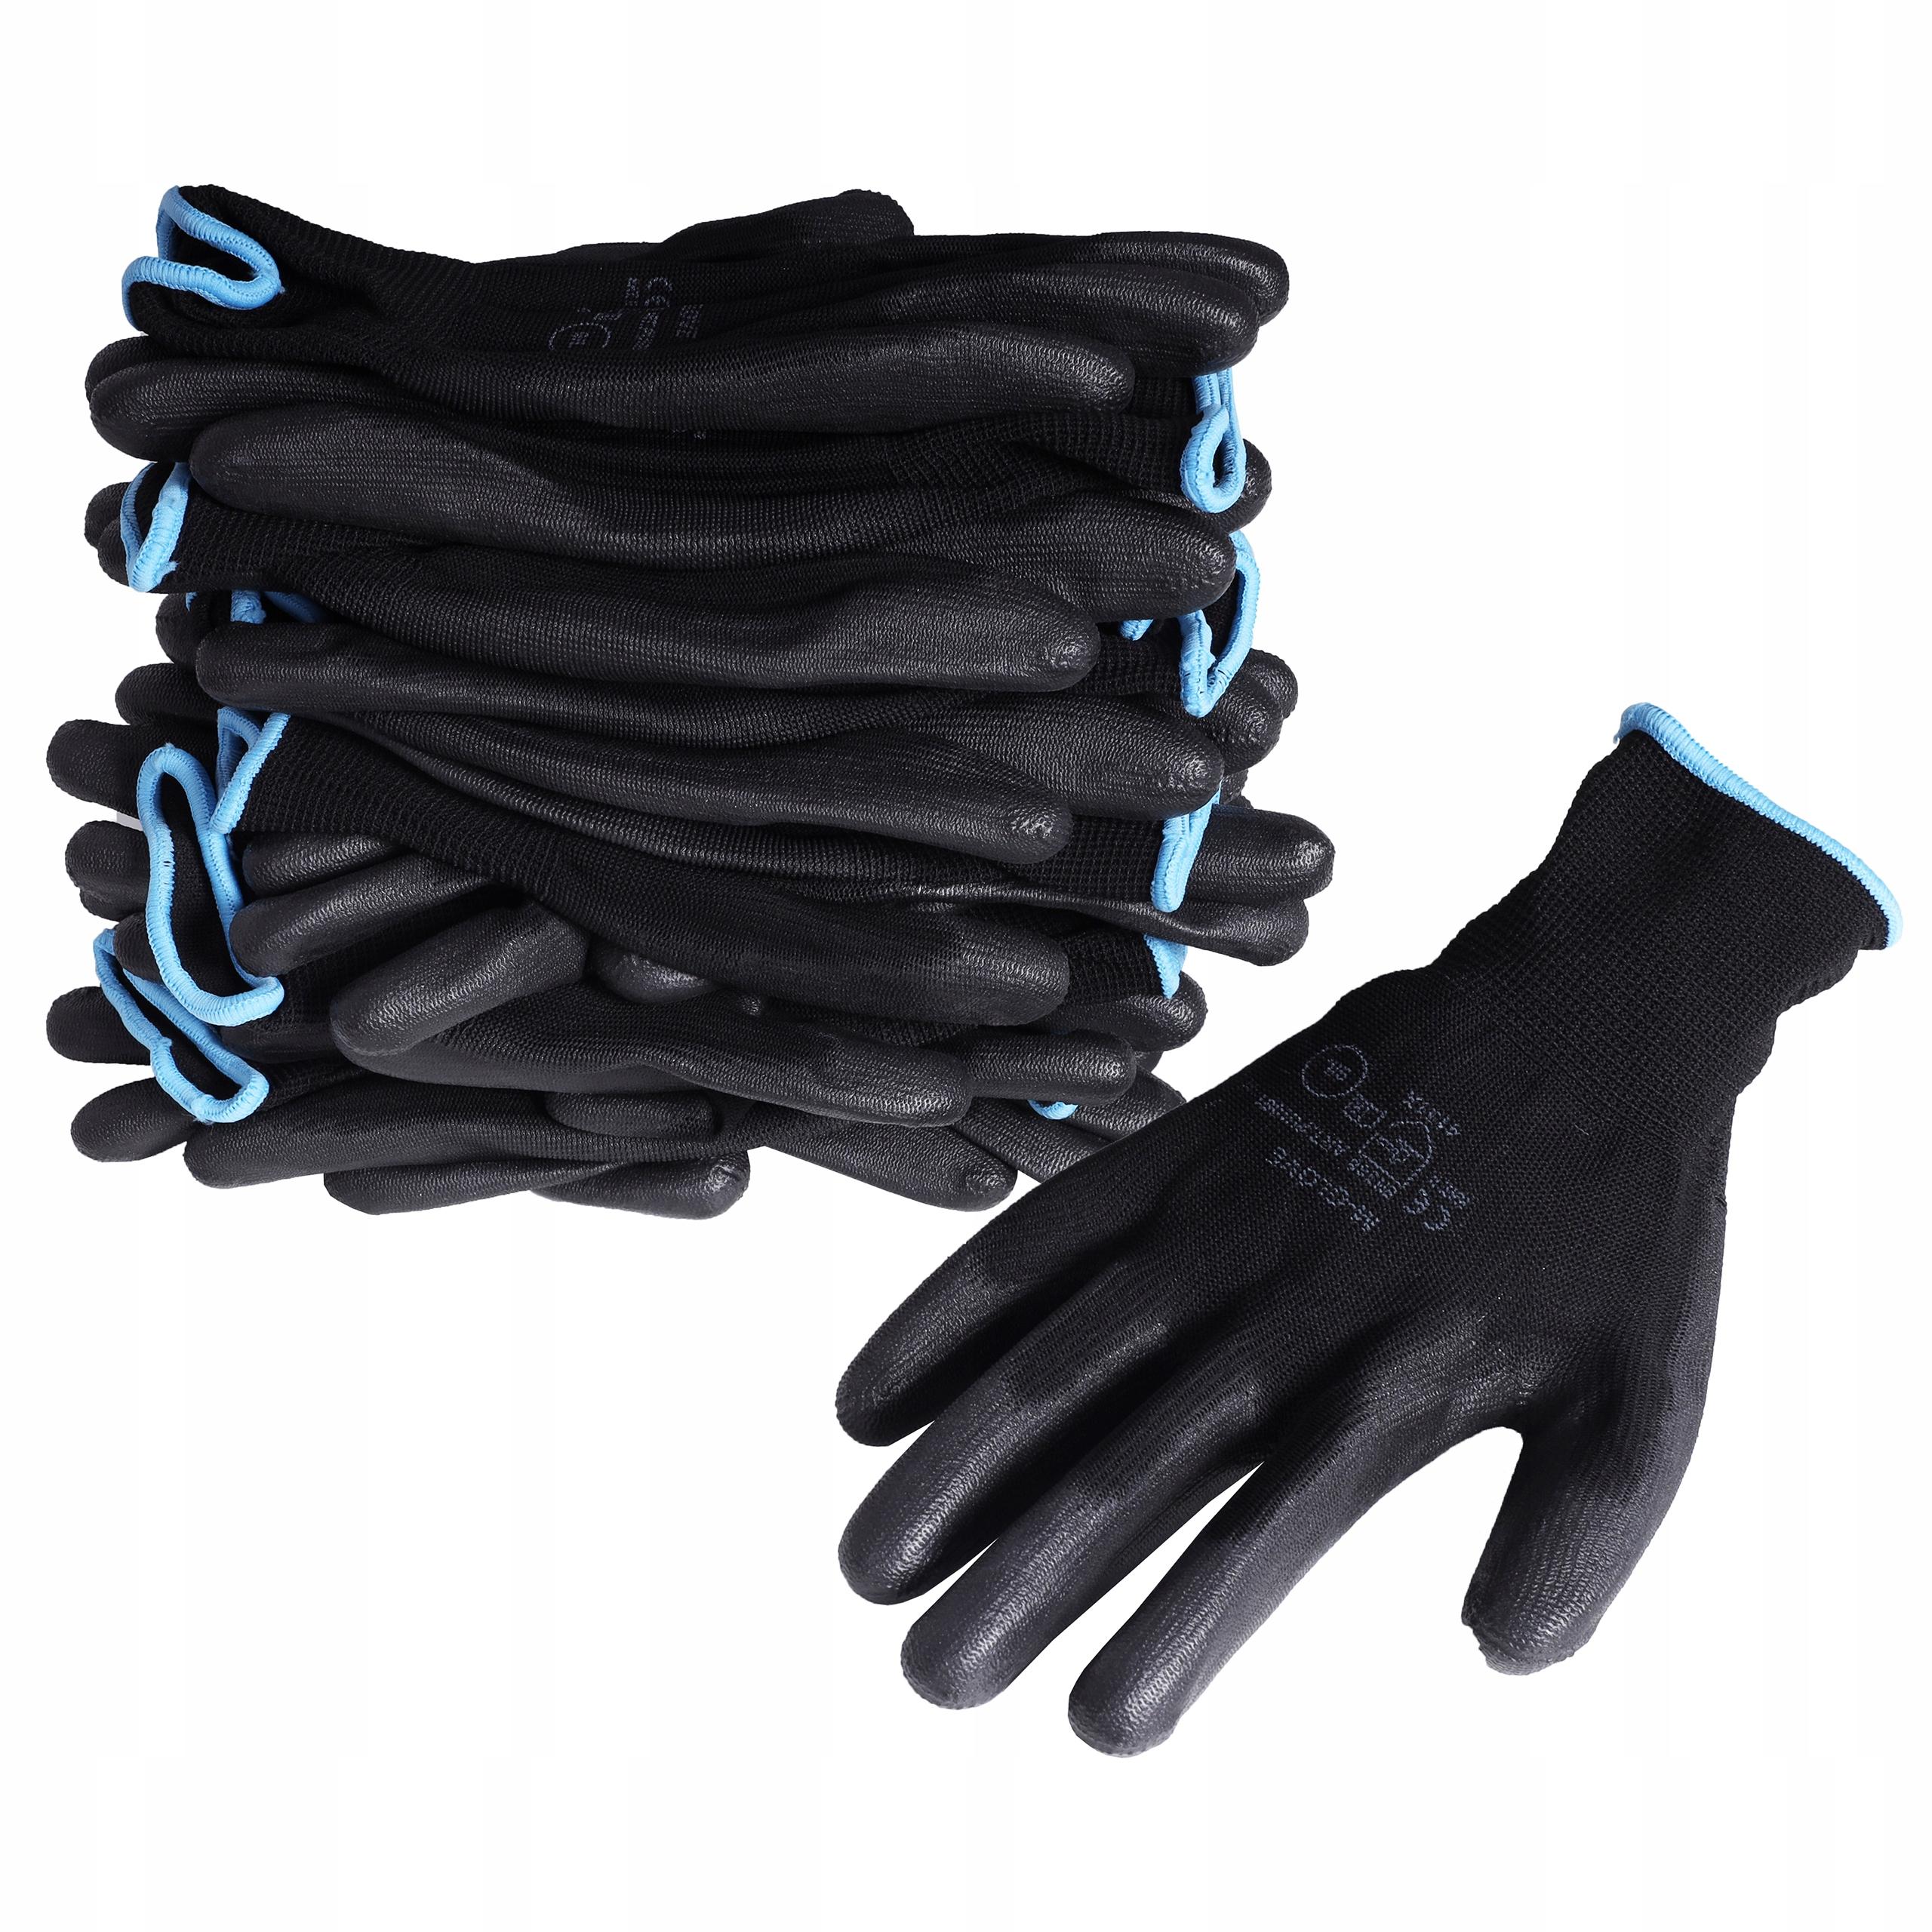 10 пар перчаток, рабочие перчатки из полиуретана